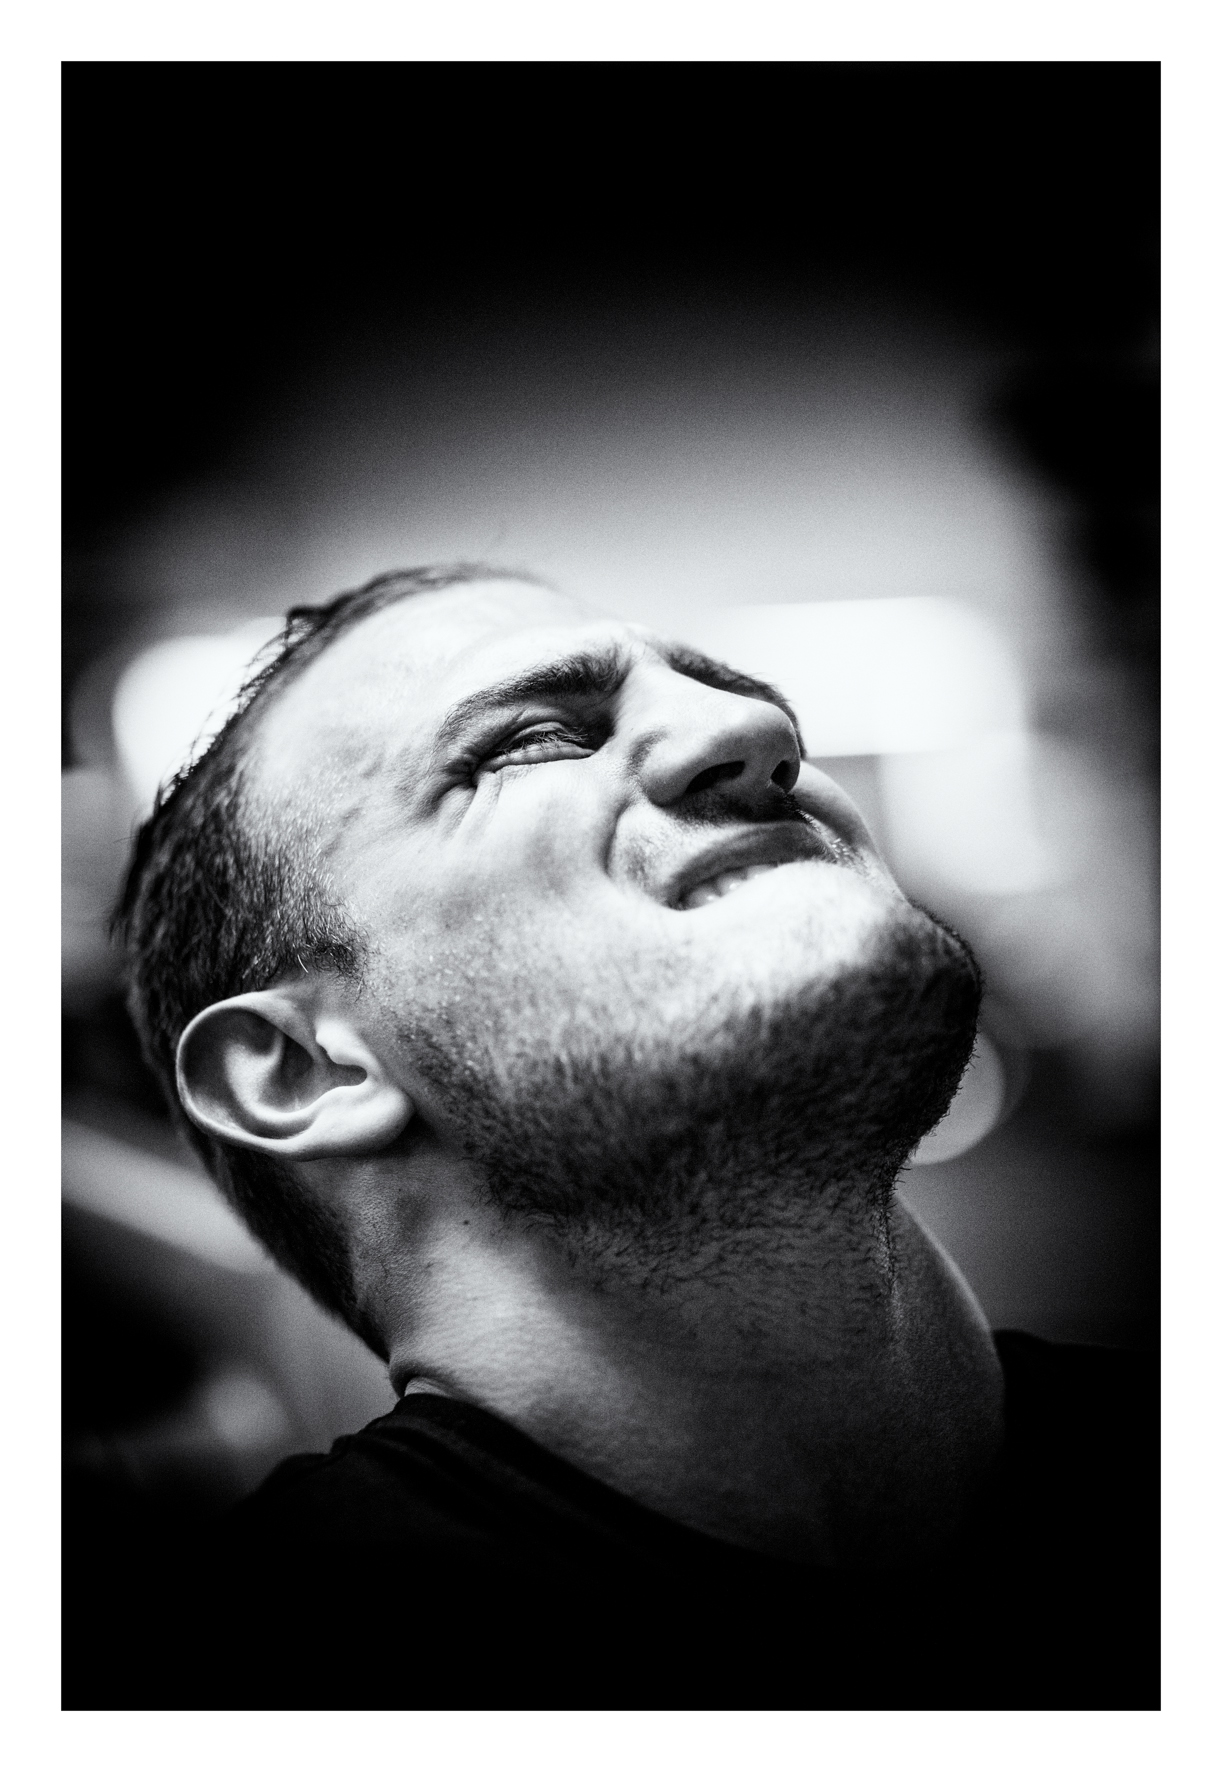 Gelsenkirchen 06.04. Francesco Pianeta  beim Krafttraining in einem Gelsenkirchner Fitnessstudio